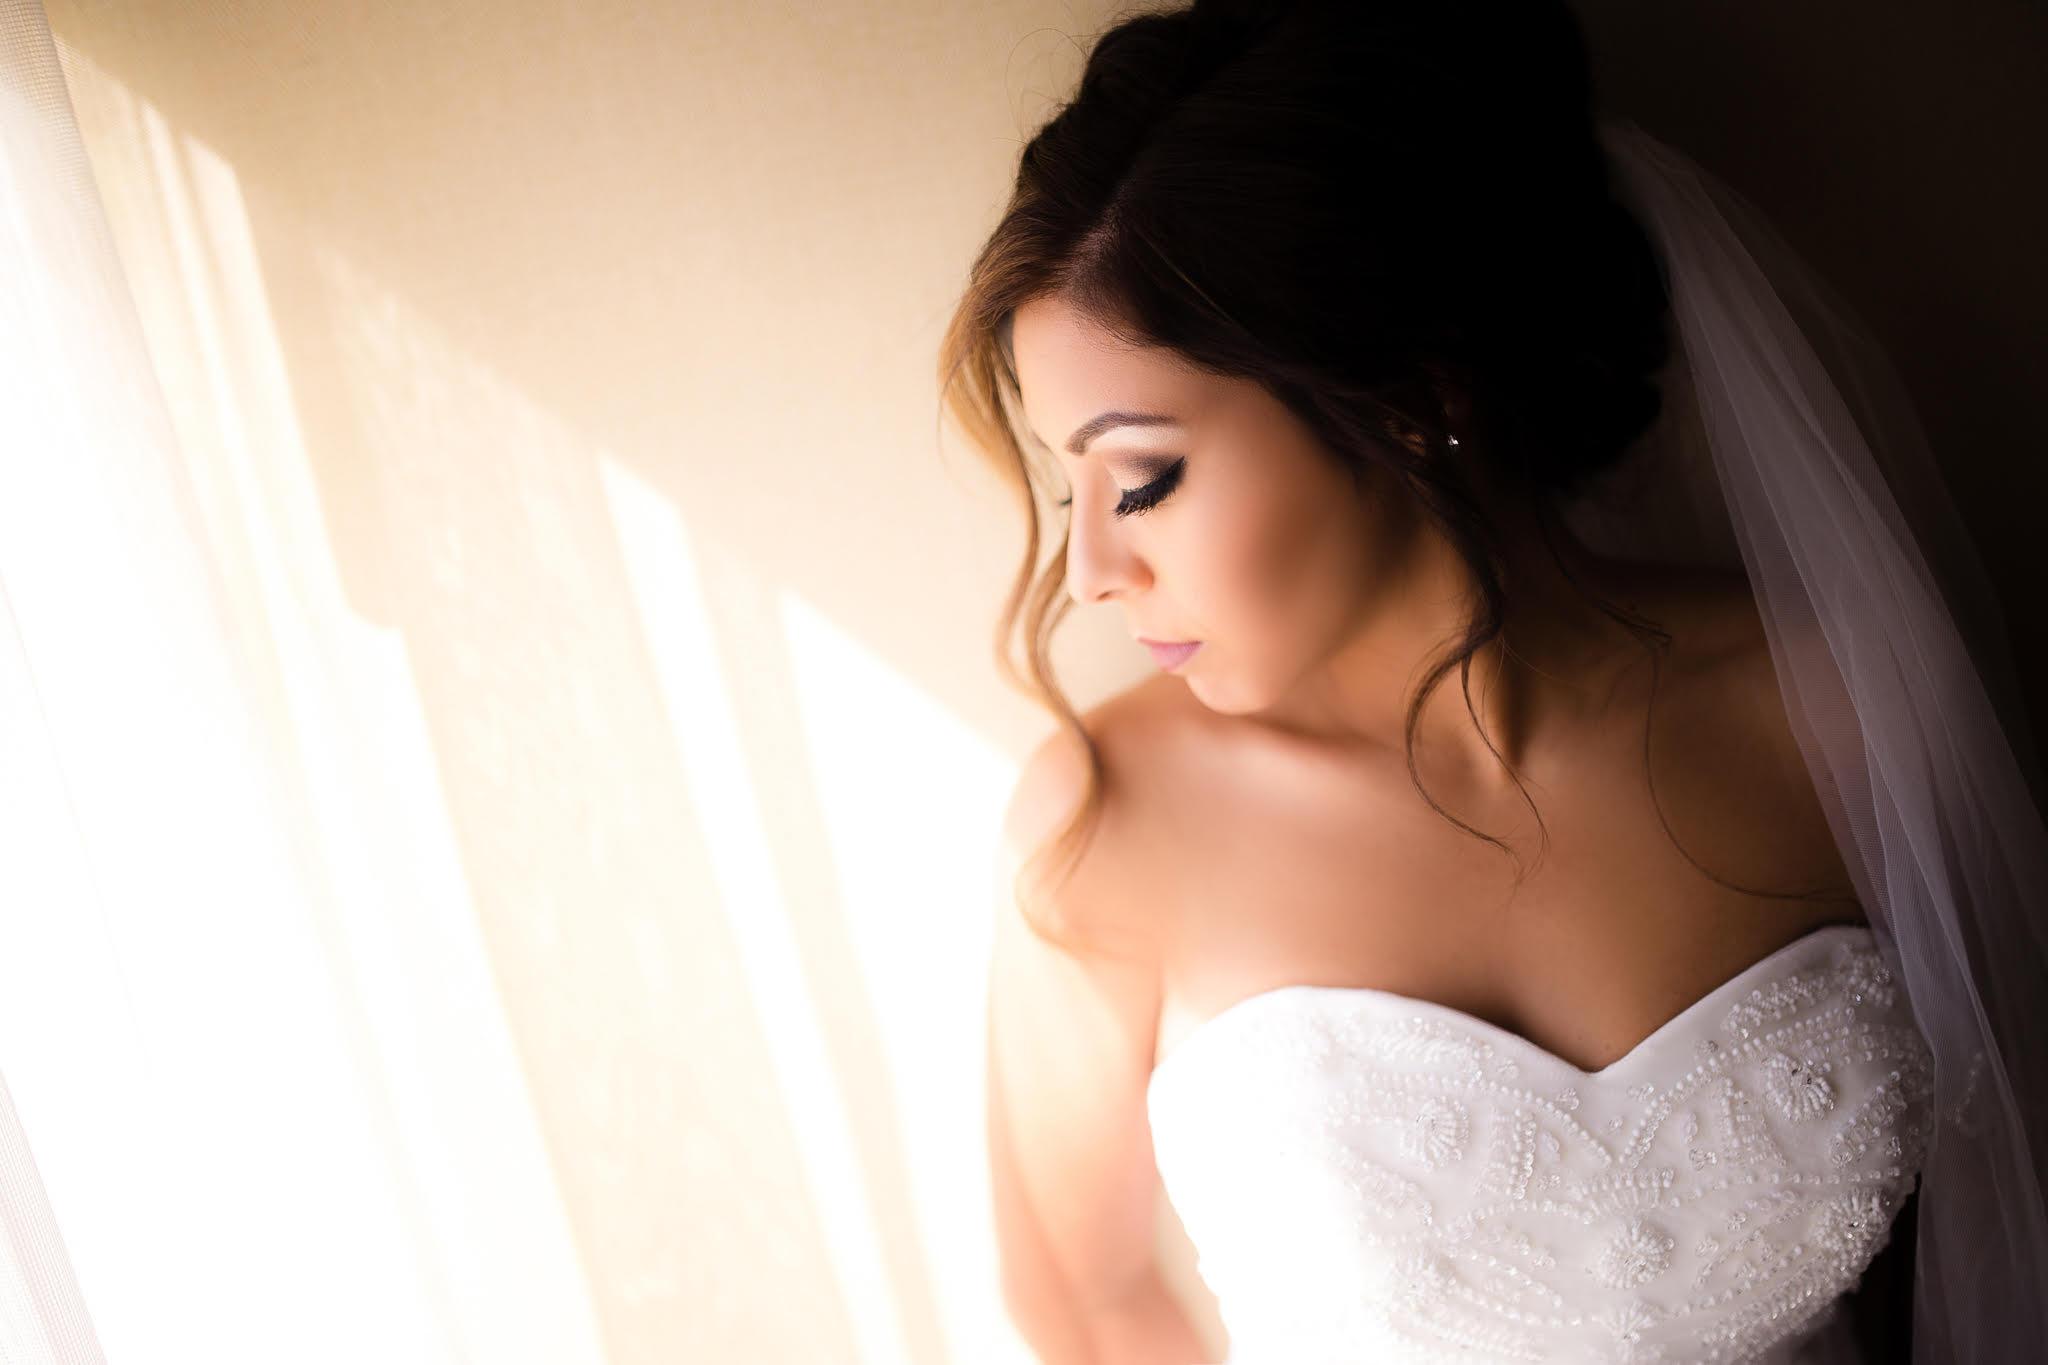 los-angeles-wedding-photography-beautiful-bride-closing-eyes-by-window.jpg